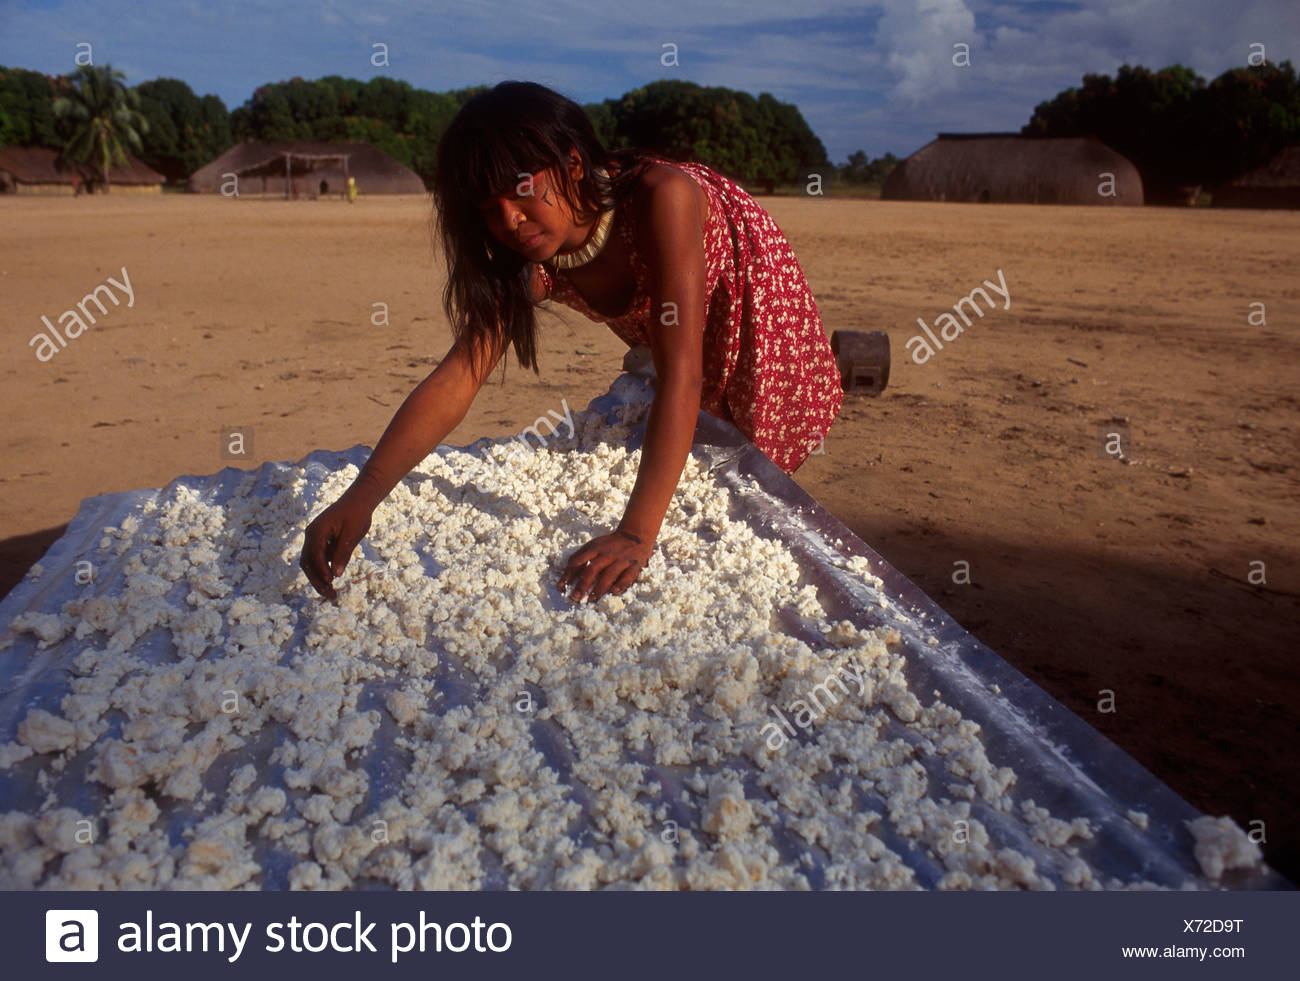 Mehinako Indigenous People Xingu Amazon rain forest Brazil Manioc flour Indigenous women wearing dress - Stock Image